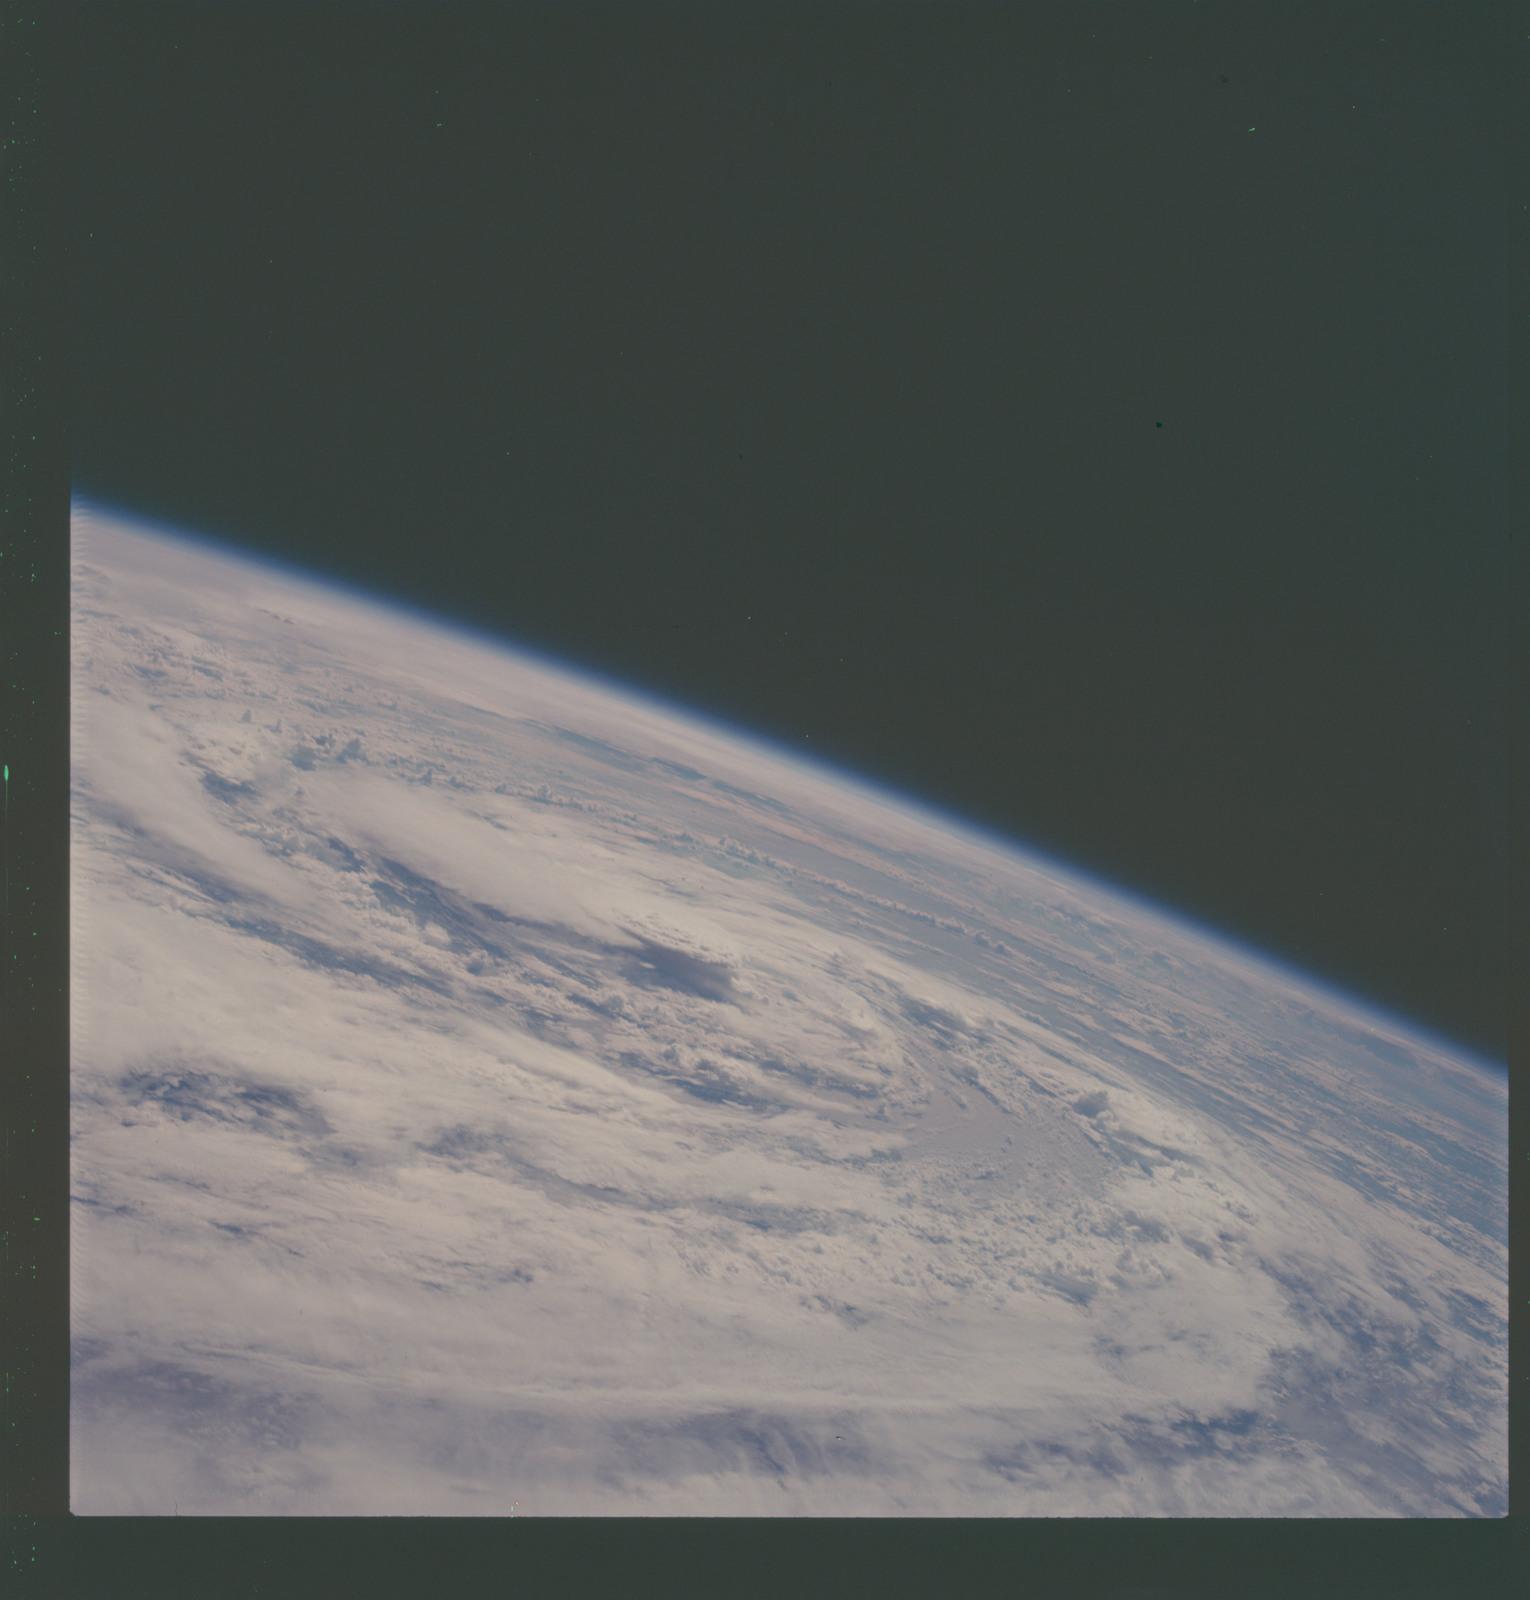 AS07-07-1876 - Apollo 7 - Apollo 7 Mission, Hurricane Gladys in the Gulf of Mexico